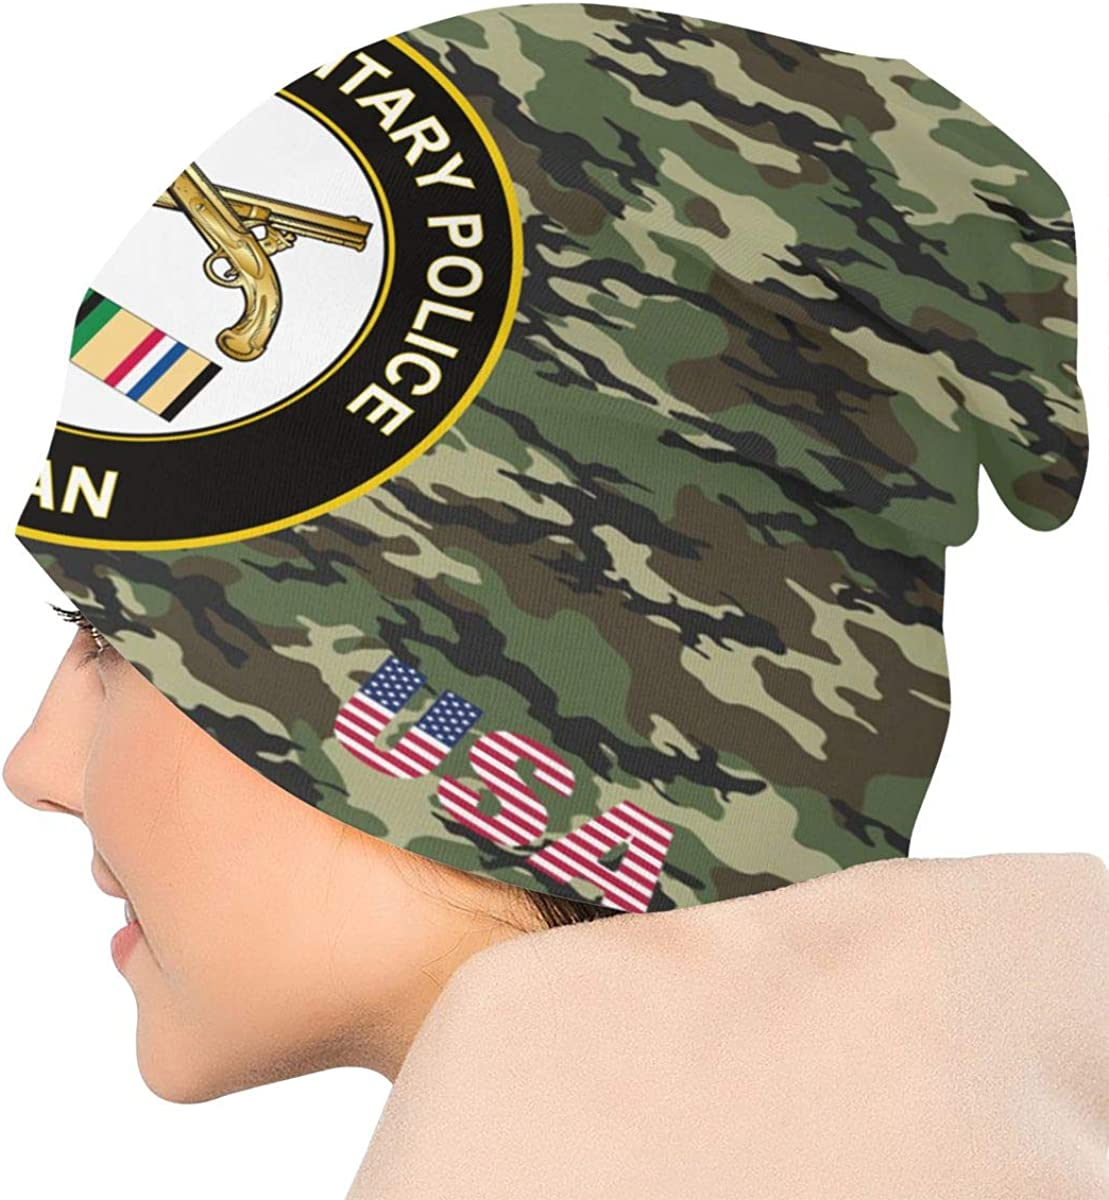 ZHONGHENJIUDIANC Unisex Beanie Caps Camouflage Army Military Police Gulf War Veteran 3D Printing Skull Cap